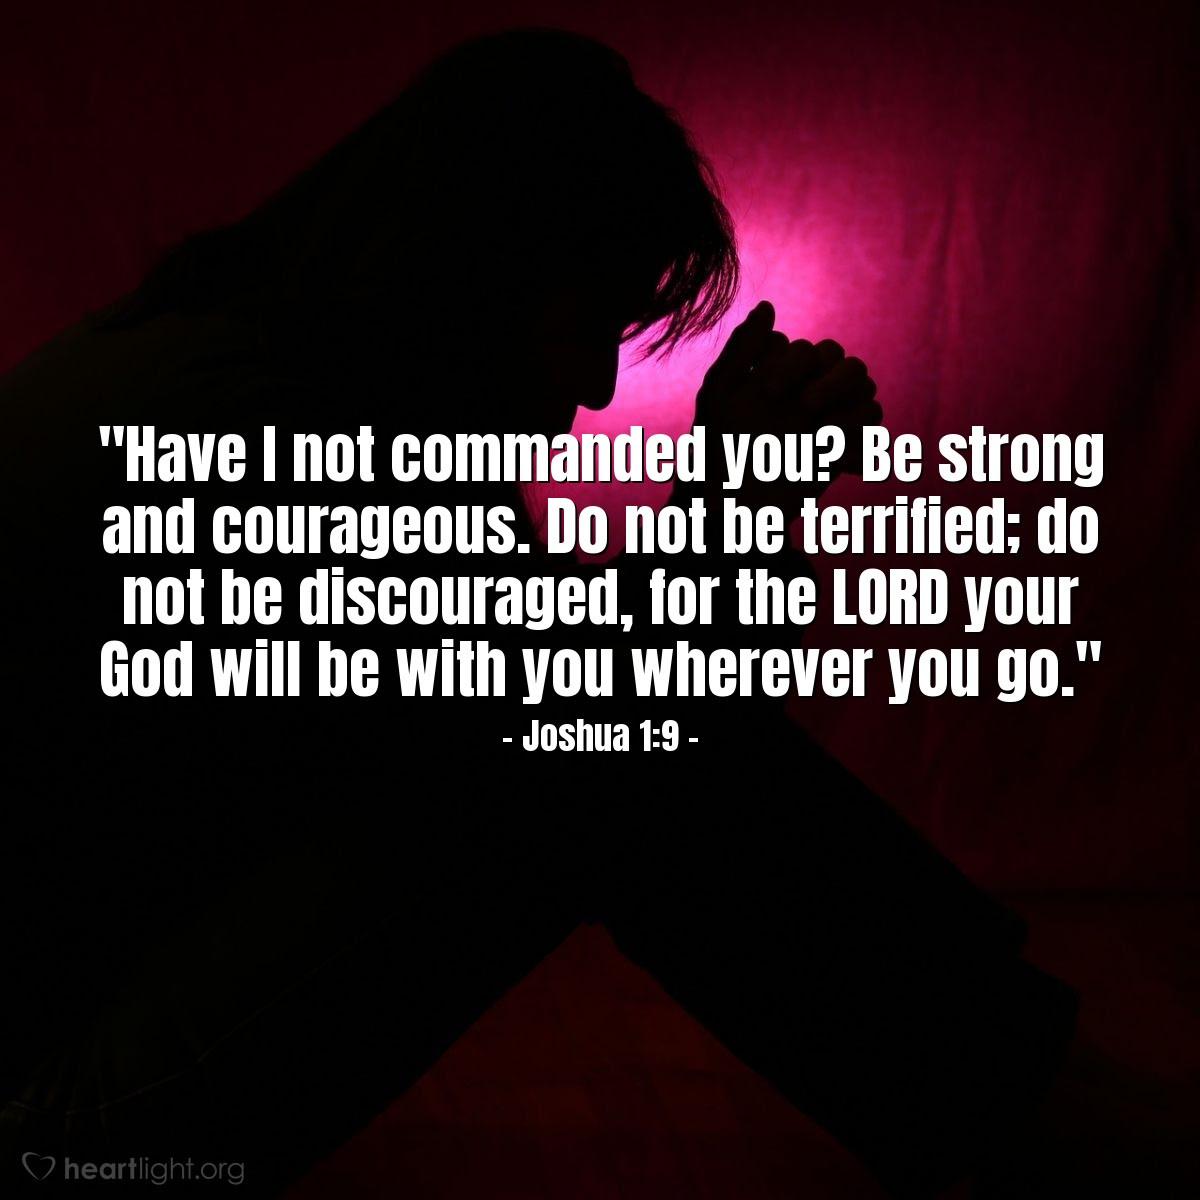 Illustration of Joshua 1:9